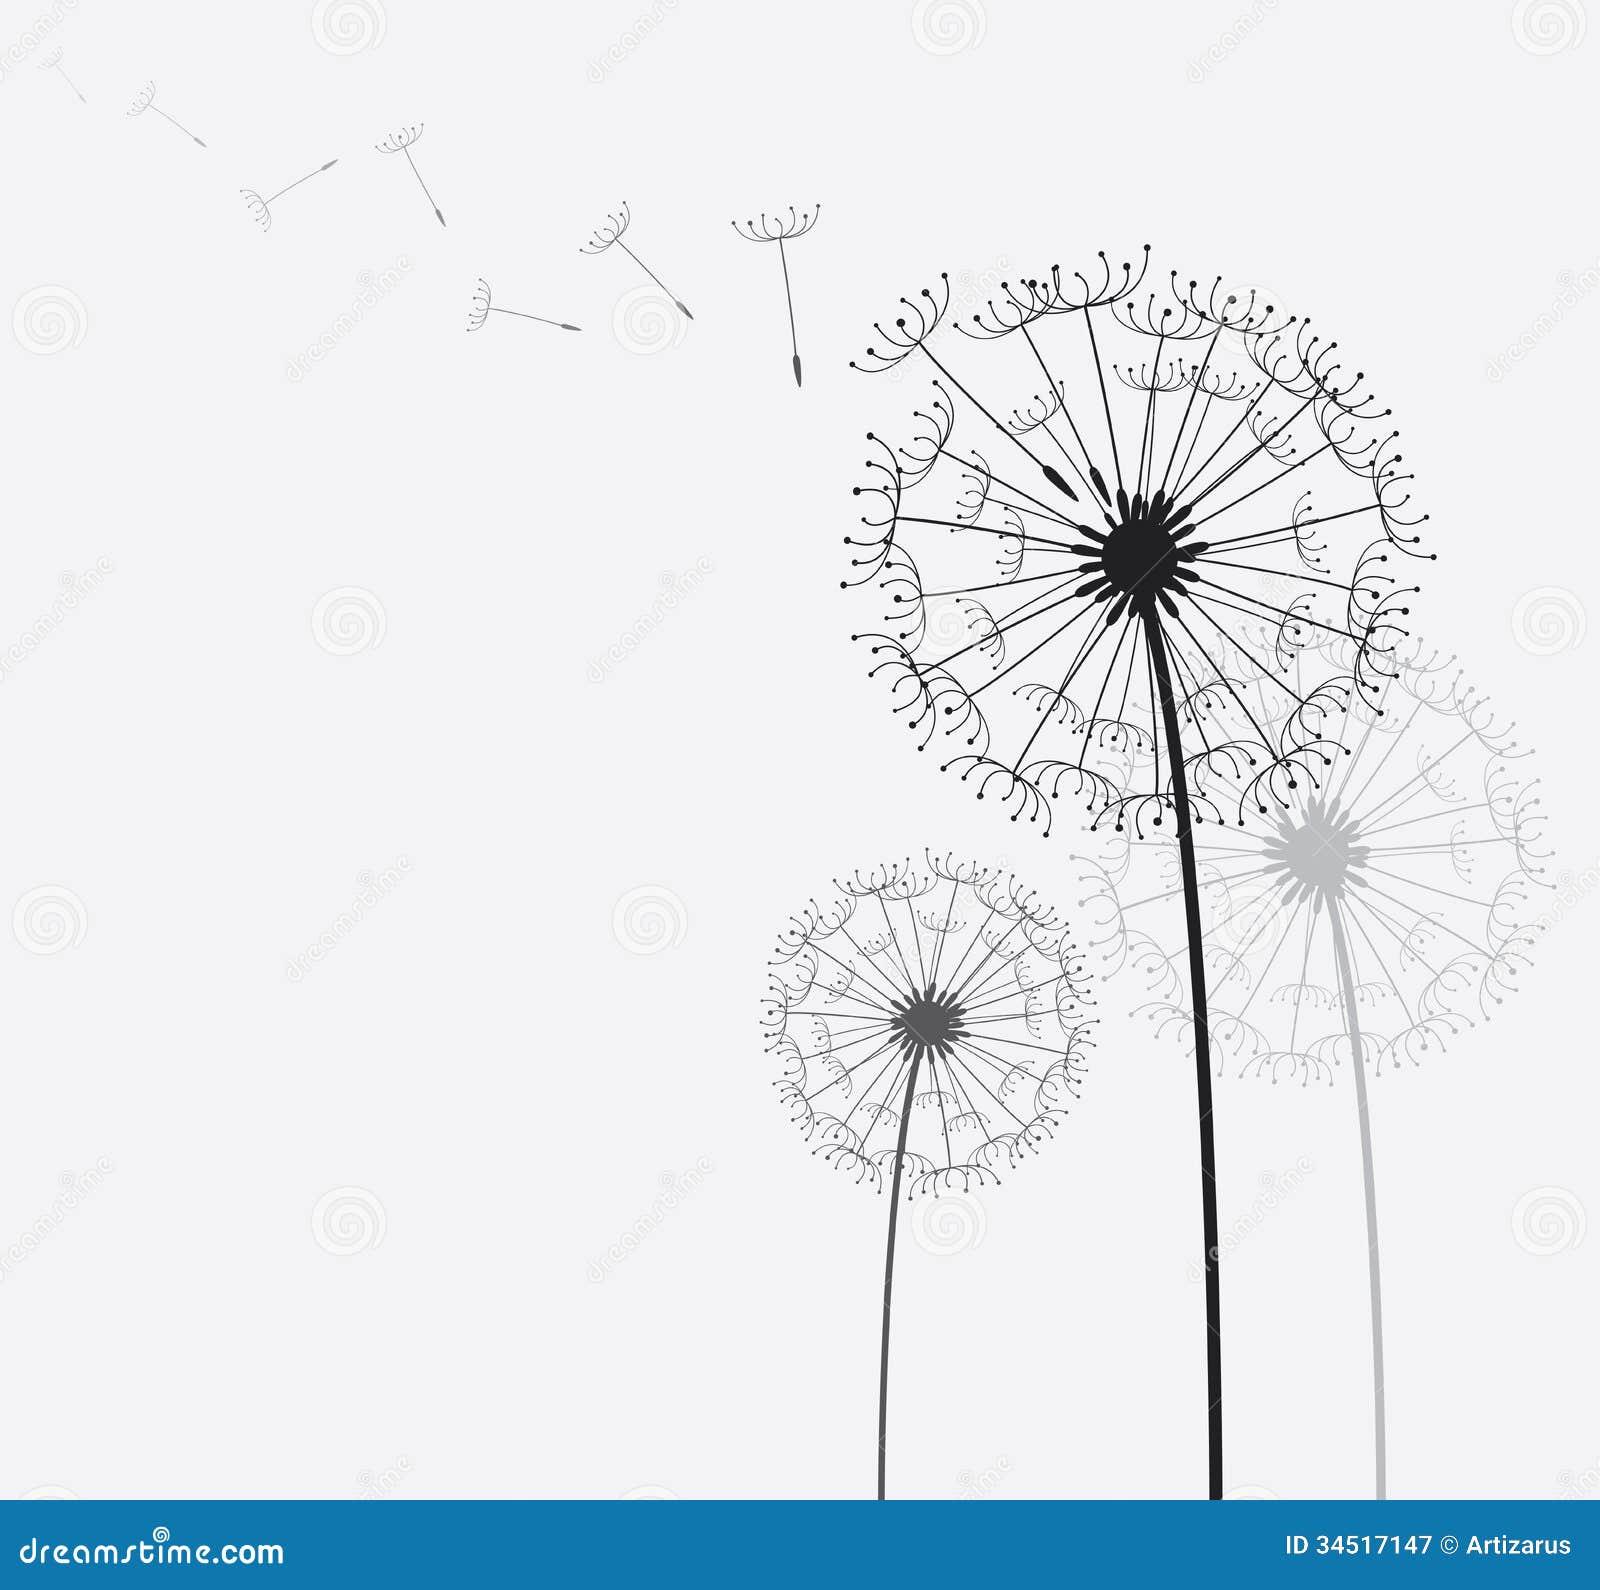 Dandelion Royalty Free Stock Photography - Image: 34517147